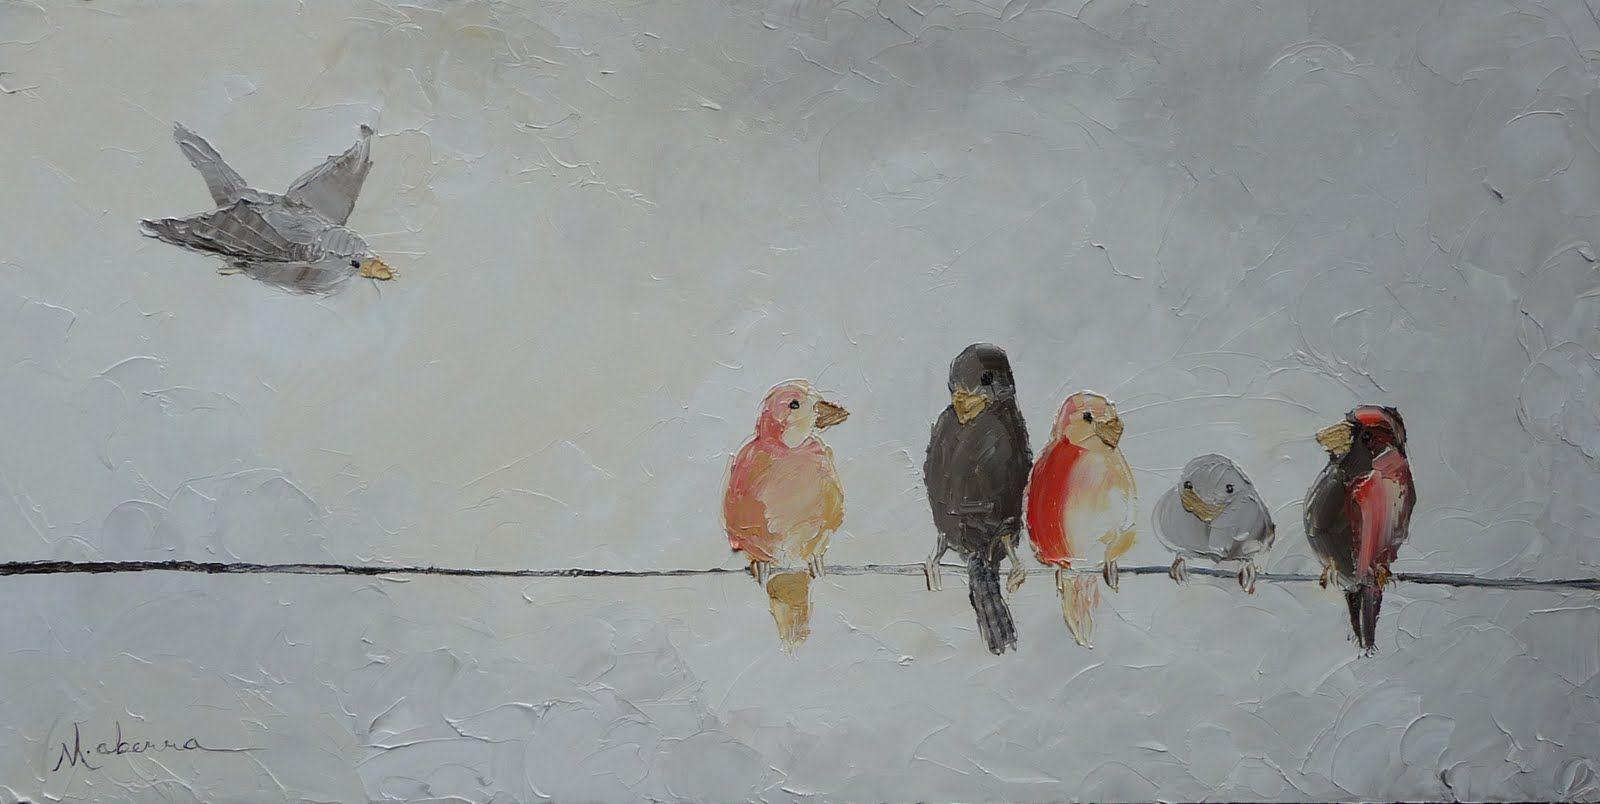 bird+on+wire+paintings | Mandie Aberra\'s Blog: Birds on a Wire ...